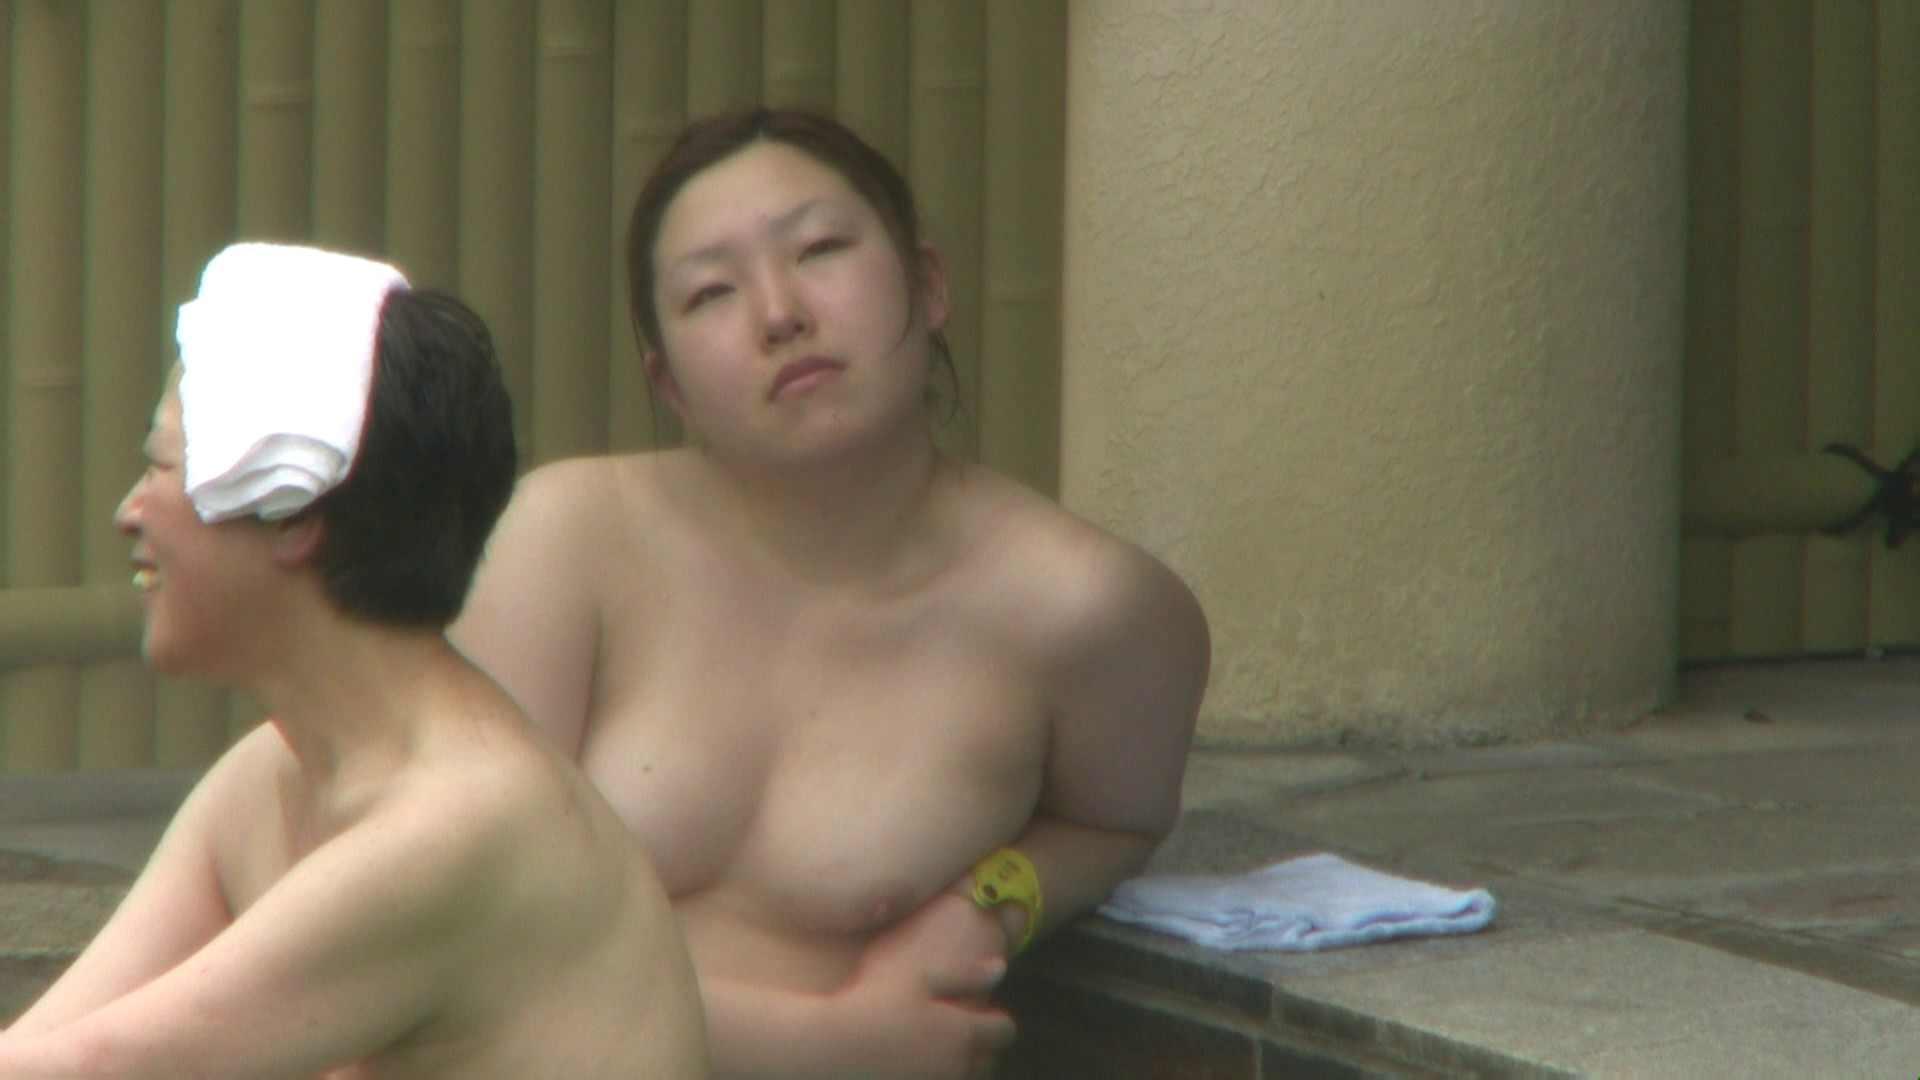 Aquaな露天風呂Vol.72【VIP限定】 露天風呂編  98PIX 38